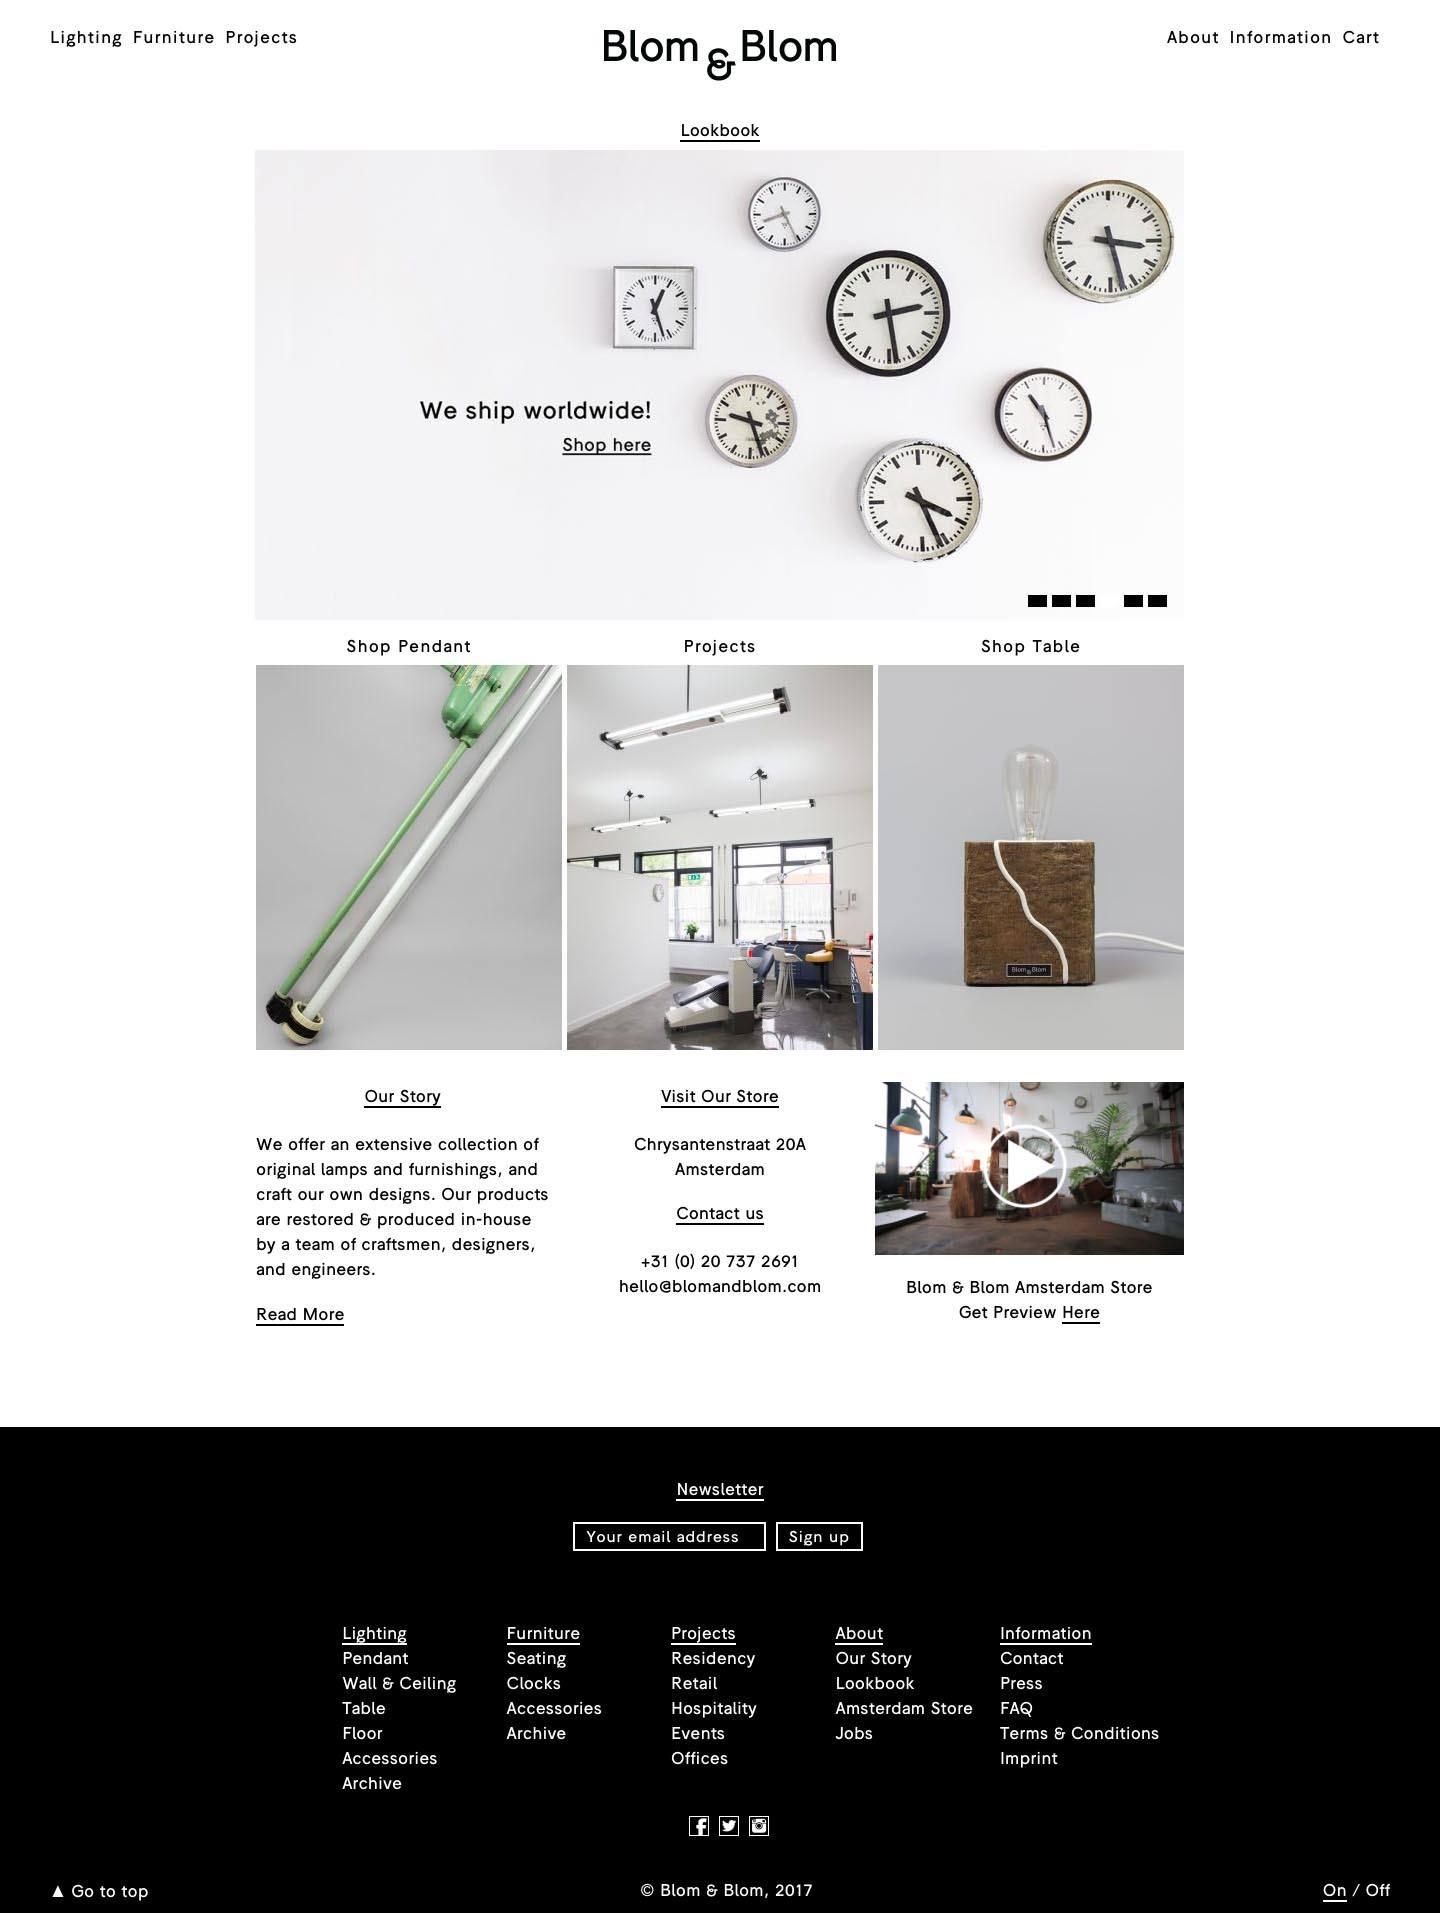 eCommerce website: Blom & Blom